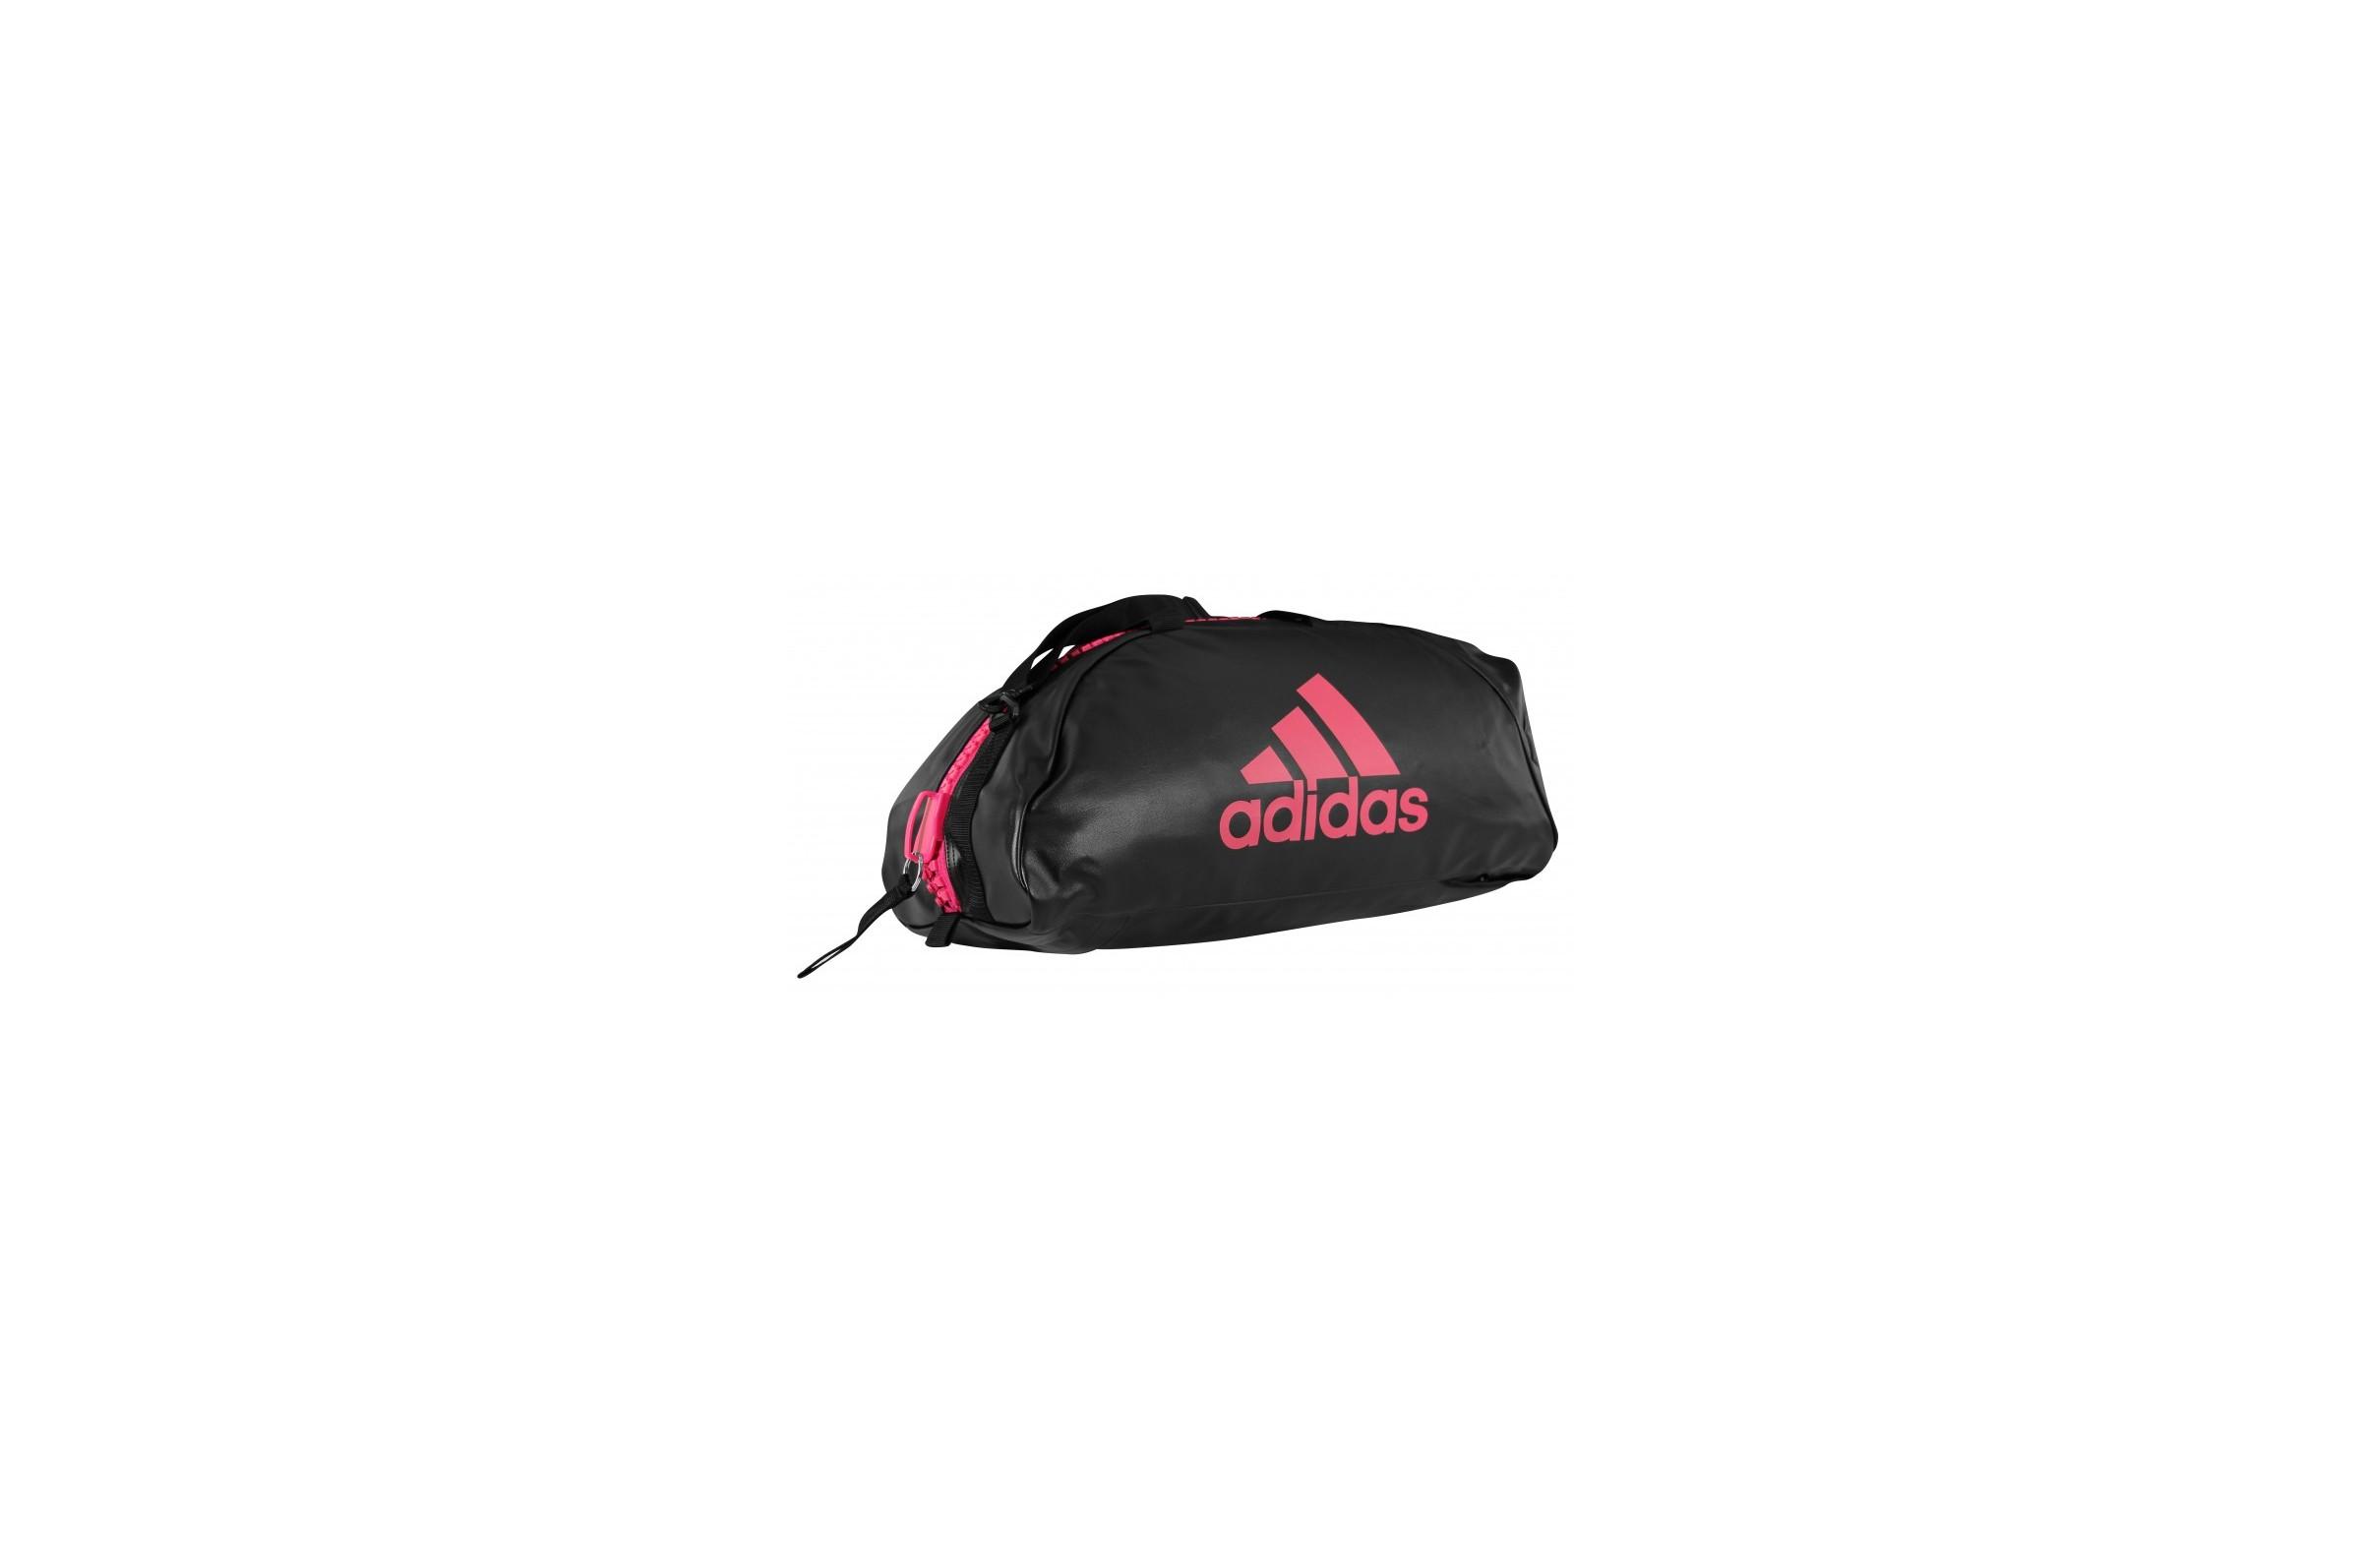 Sac de Sport, 2 en 1 ADIACC051C, Adidas DragonSports.eu